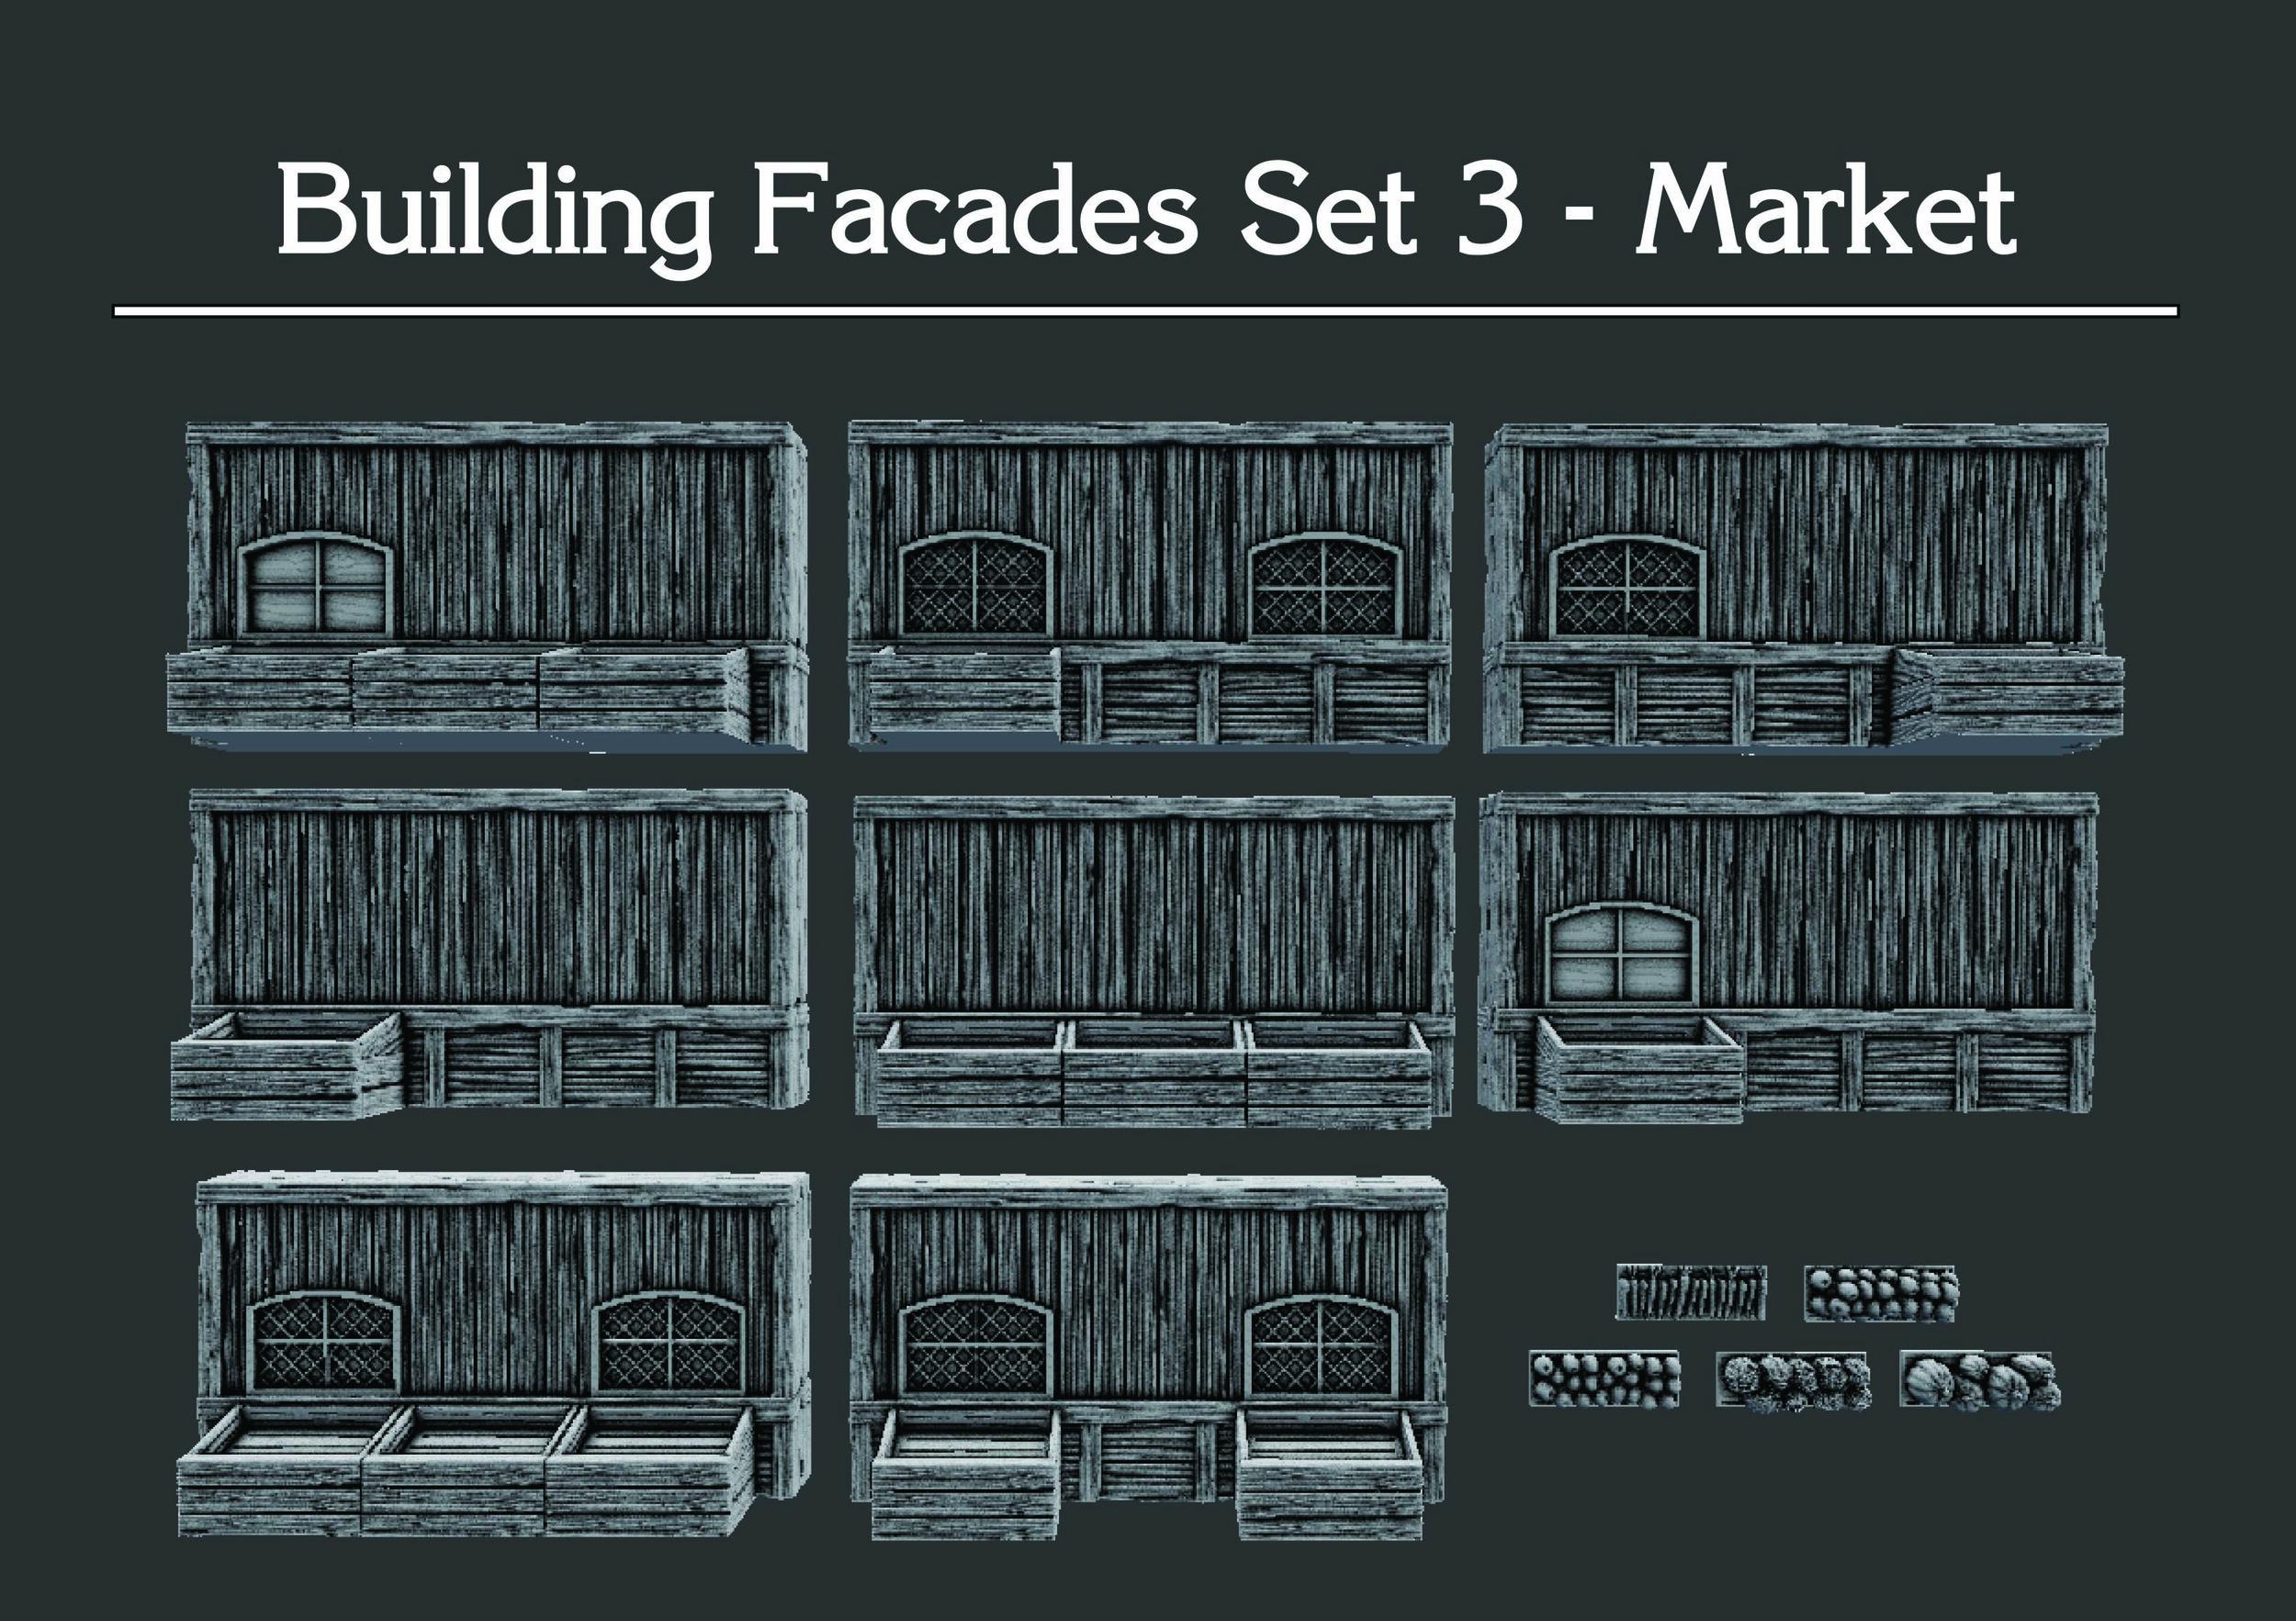 Building Facades Set 3 Market 1.1.jpg